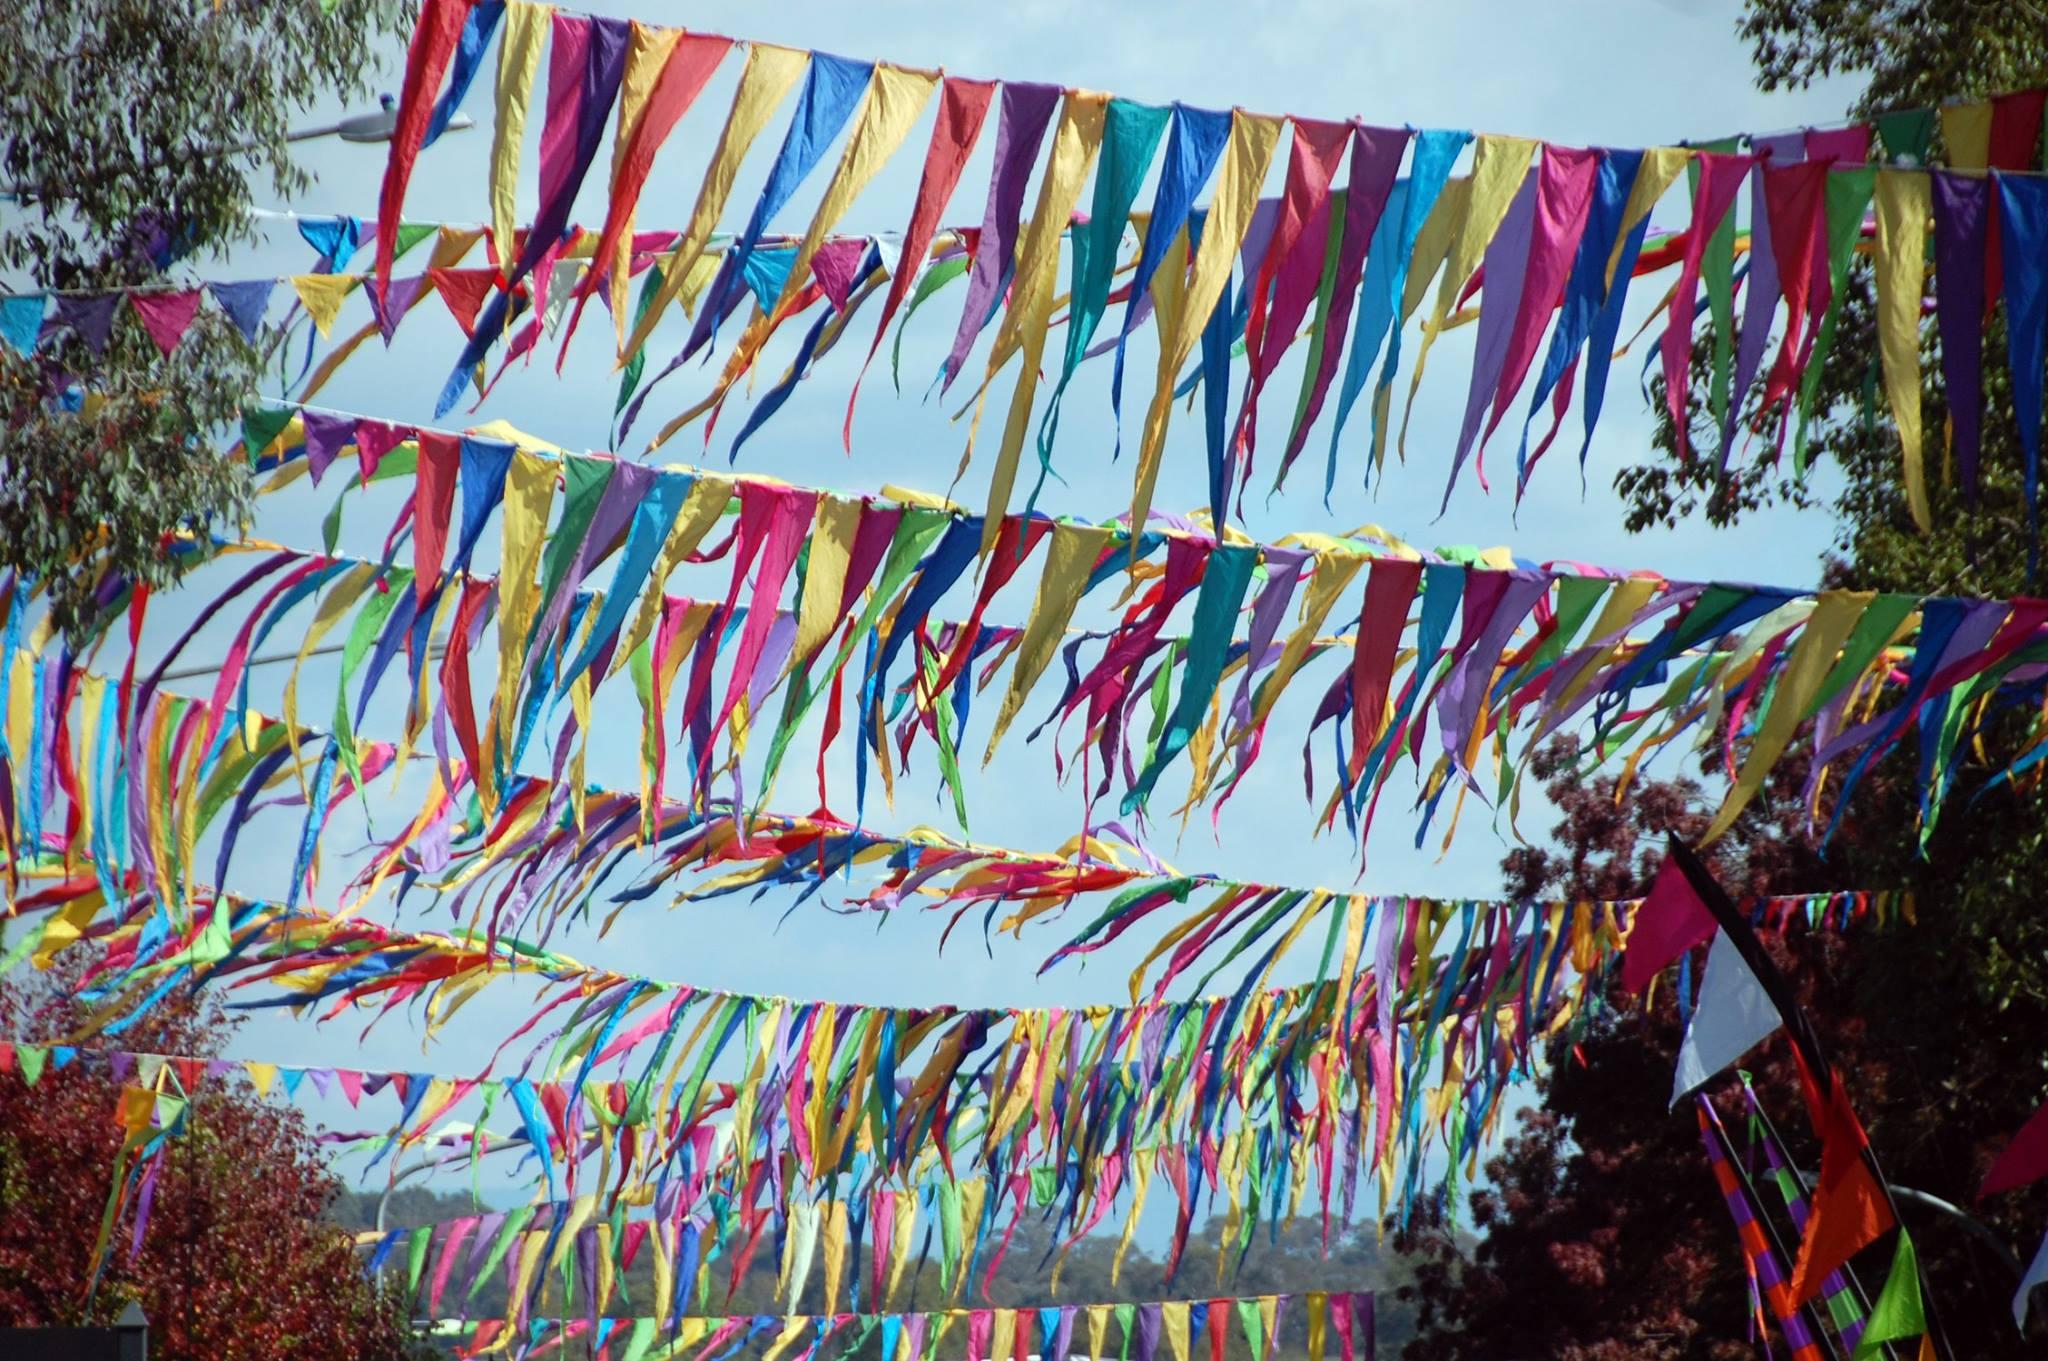 folk festival banners